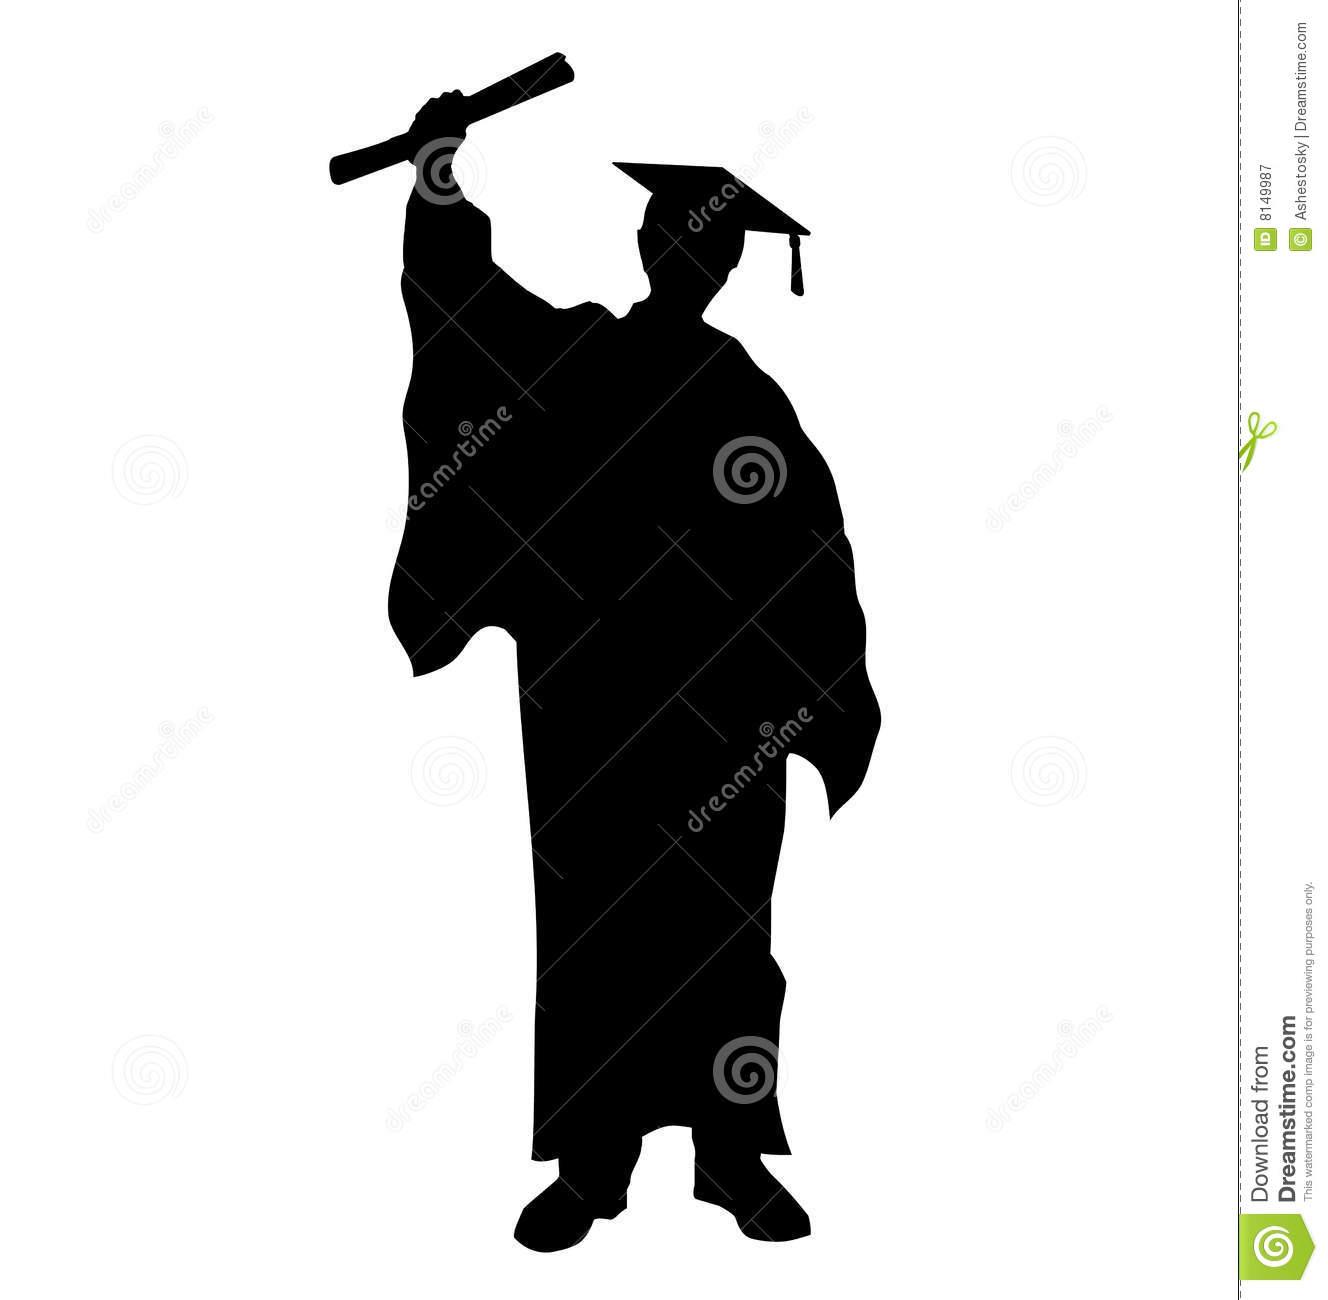 graduate student silhouette clipart panda free clipart images rh clipartpanda com Graduates Both Genres Student Success Clip Art